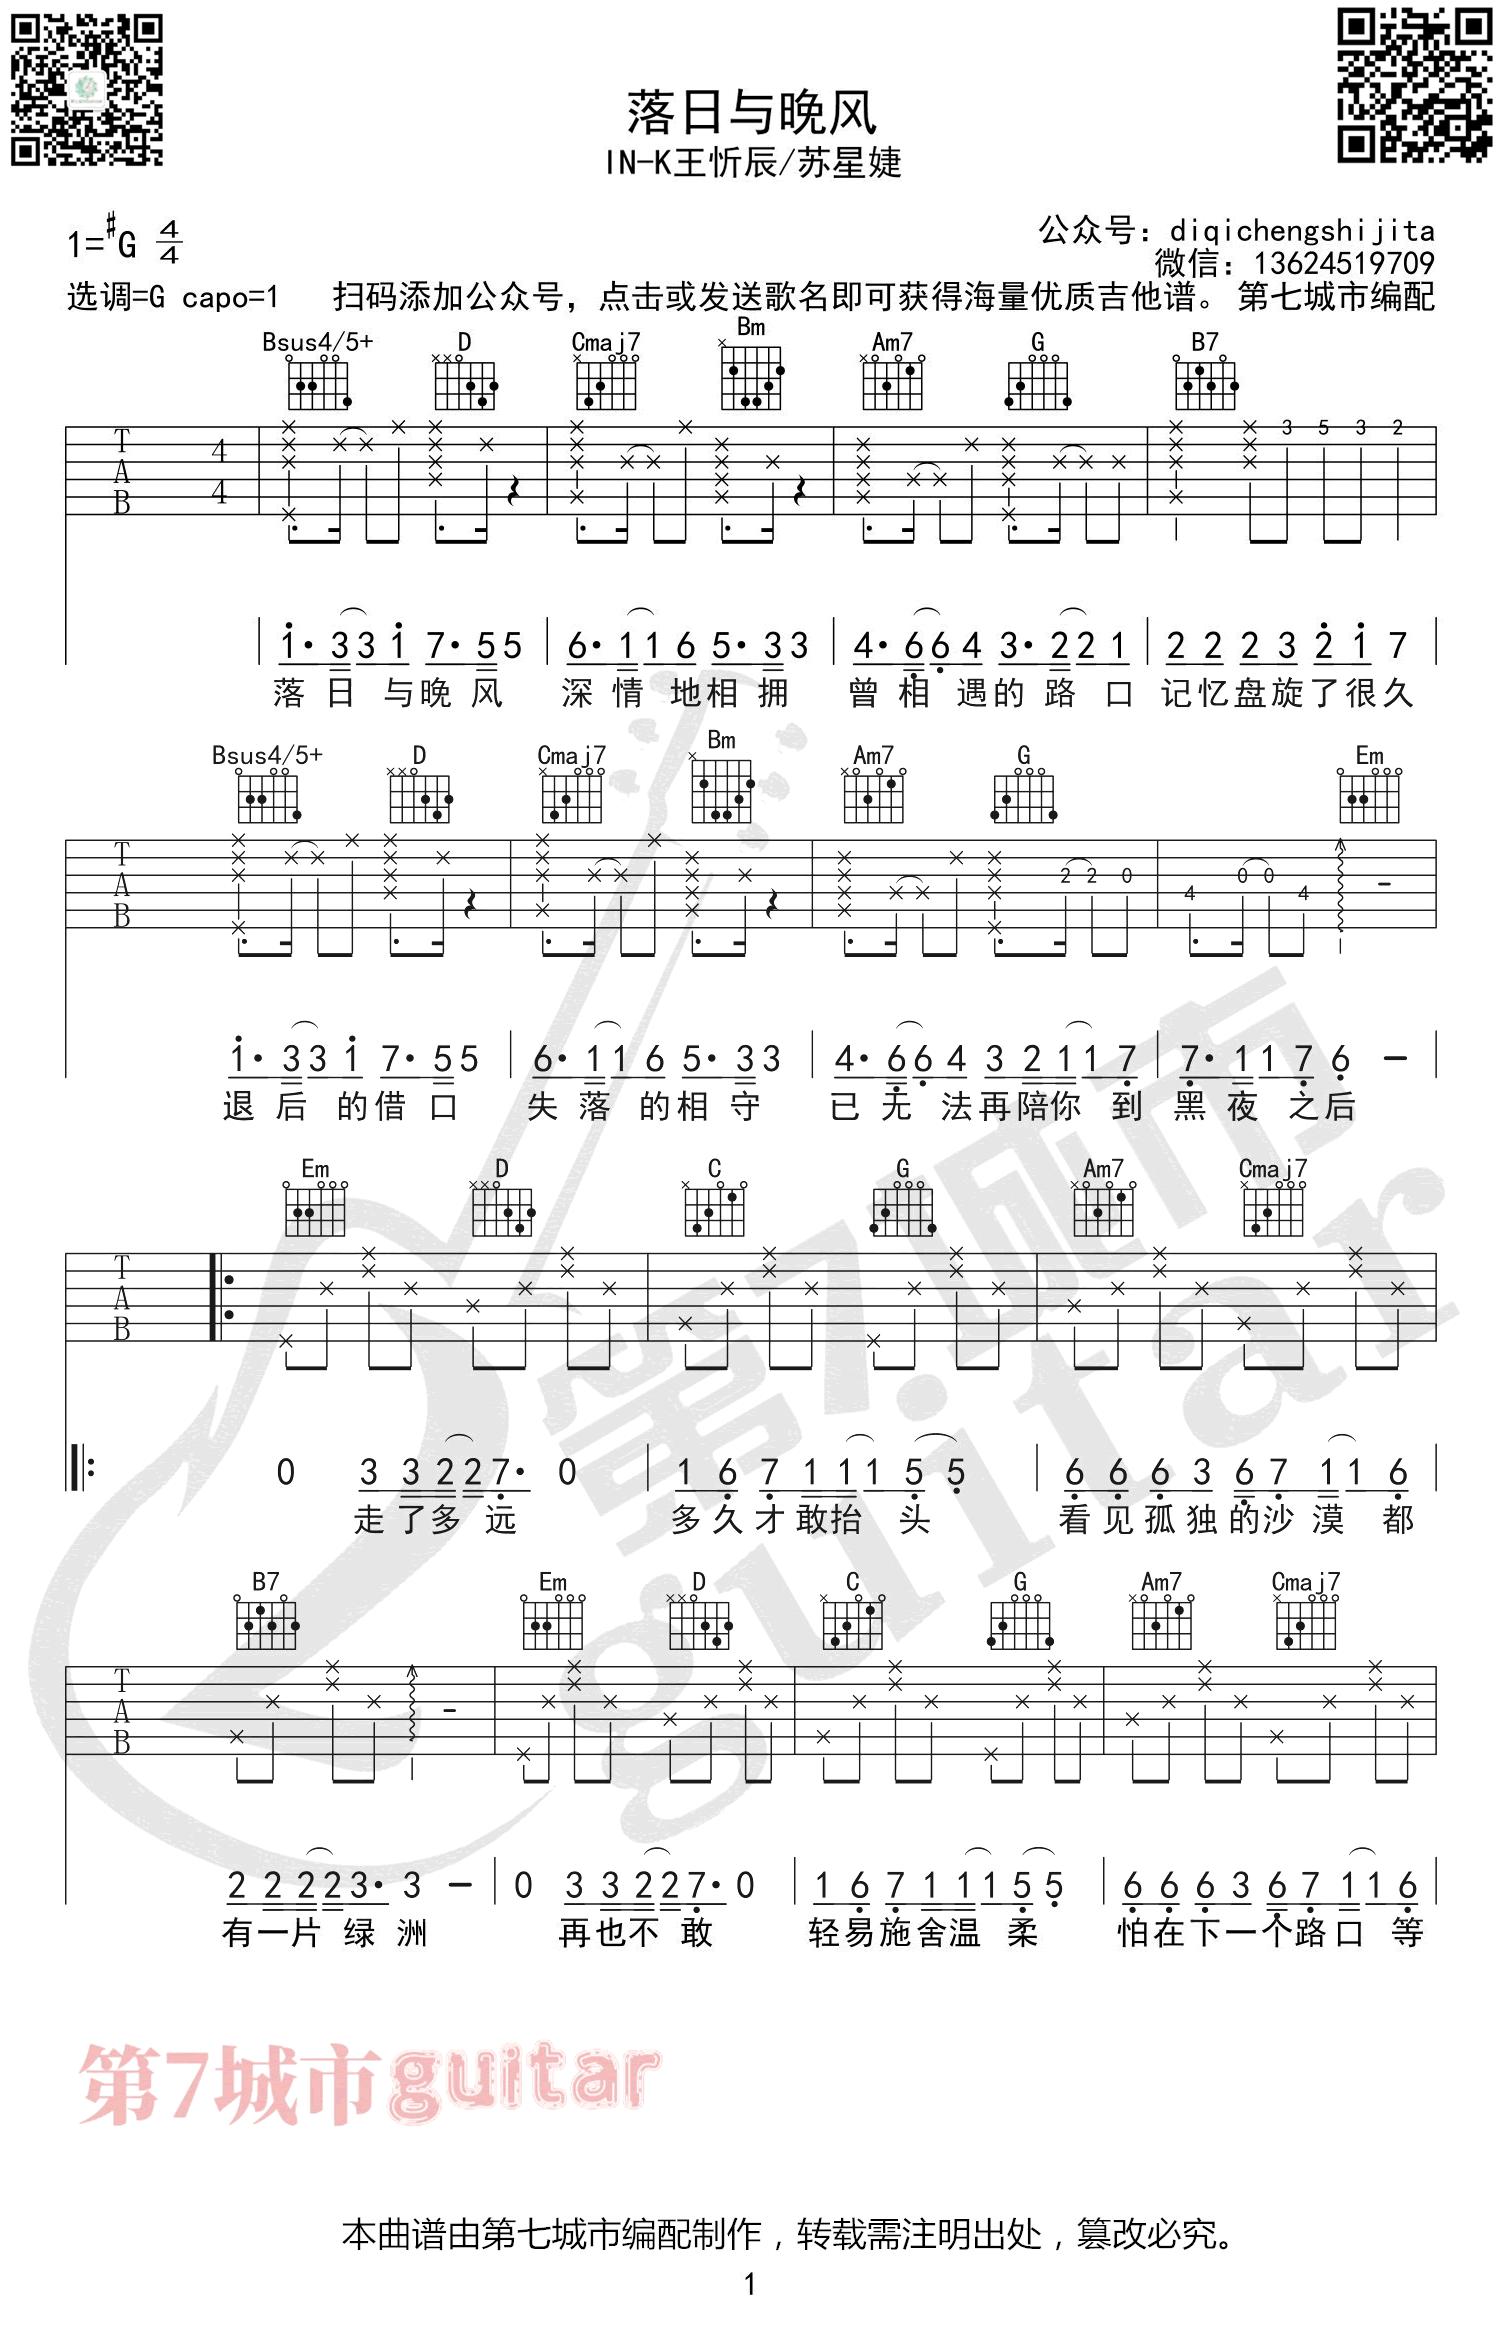 INK-落日与晚风吉他谱-1